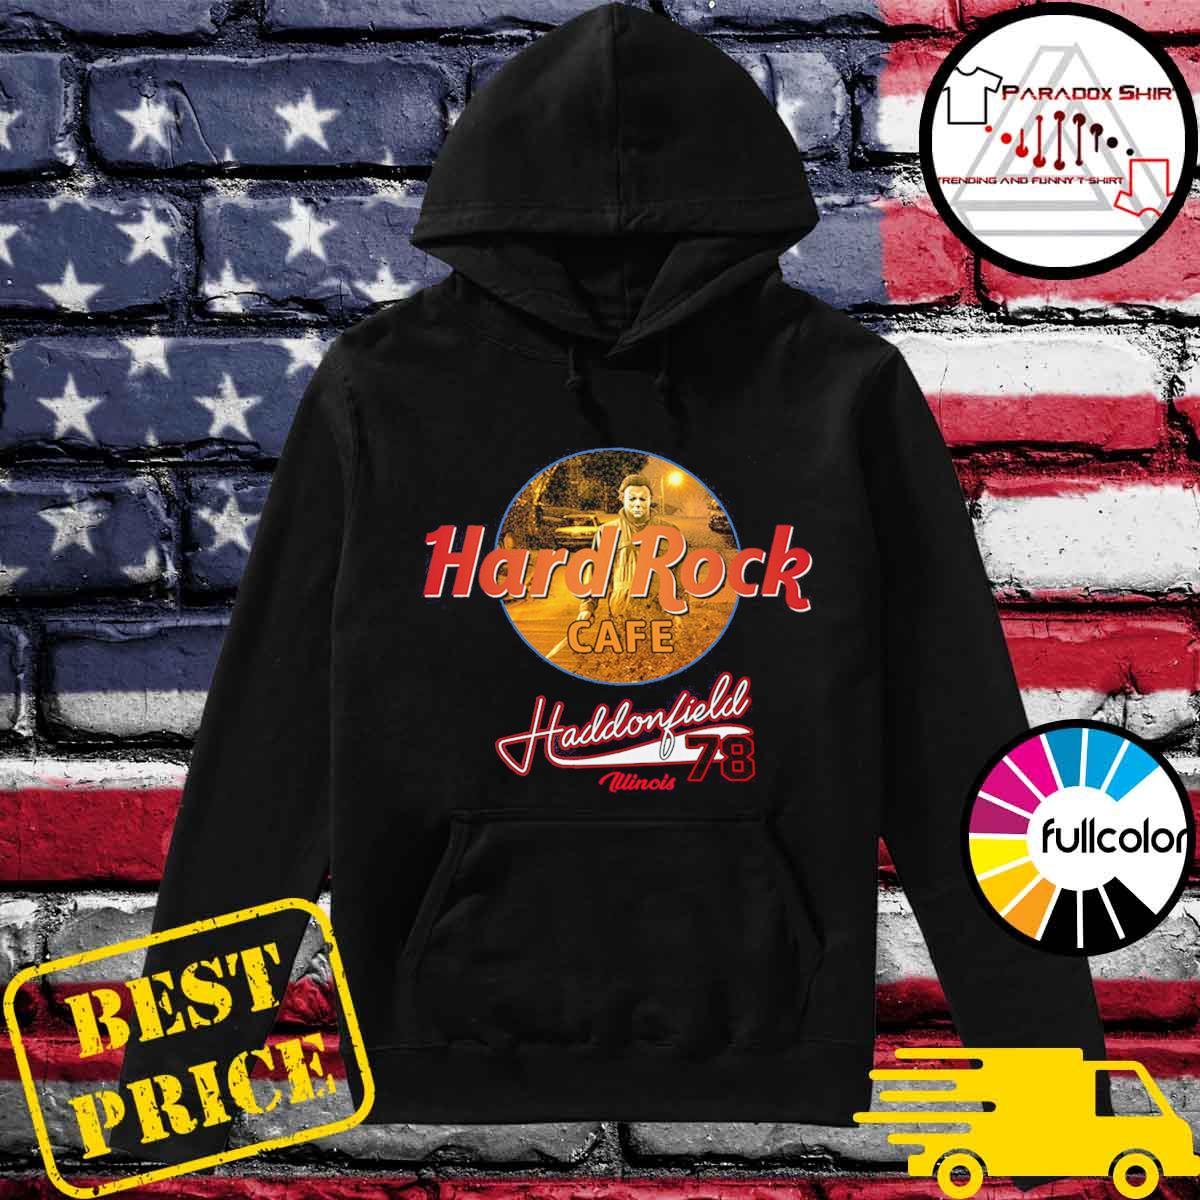 Michael Mayer Hard Rock Cafe Haddonfield illinois 78 s Hoodie